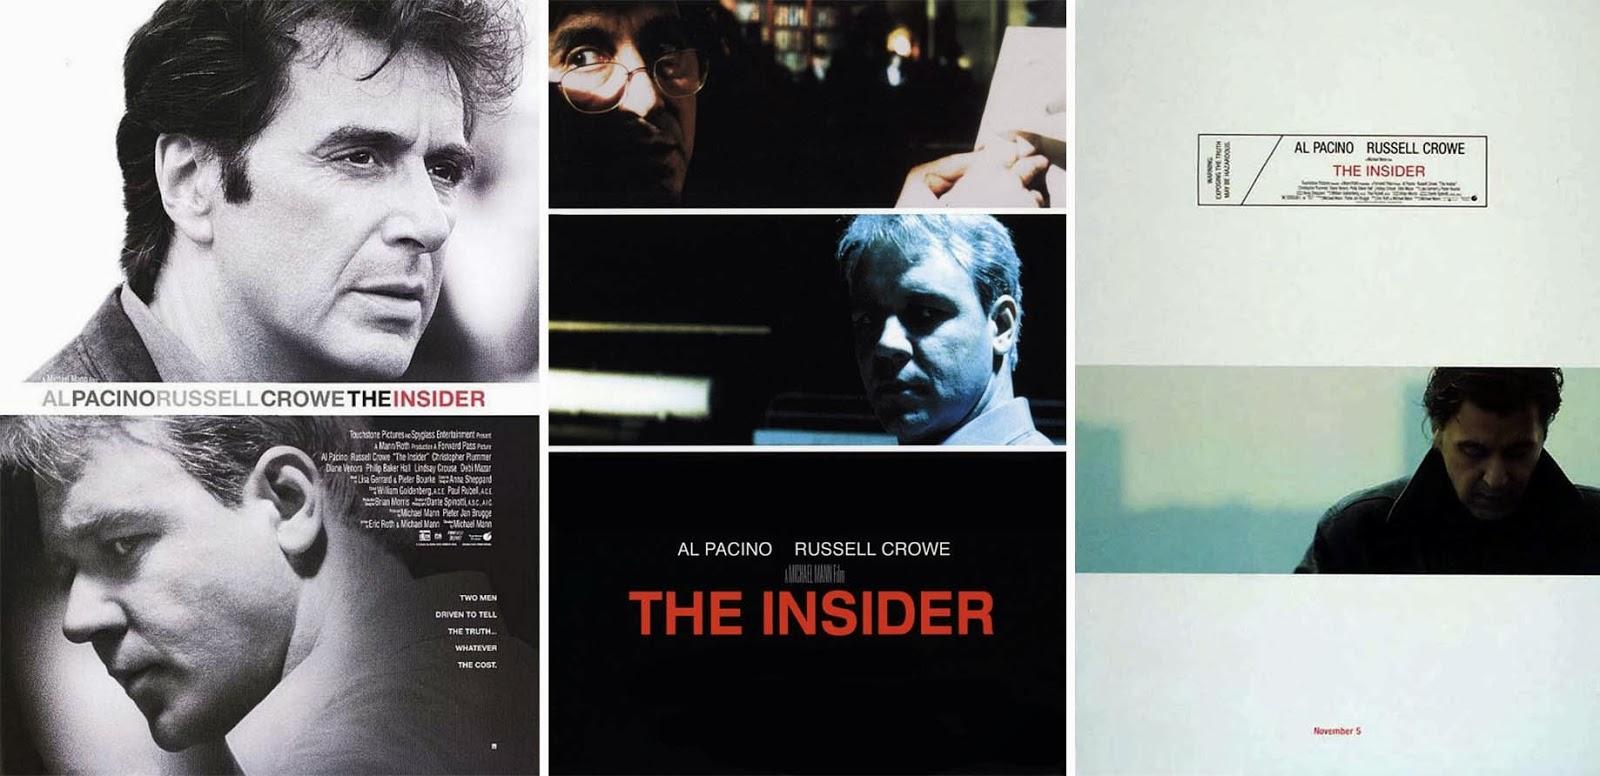 The Insider - Informator (1999)